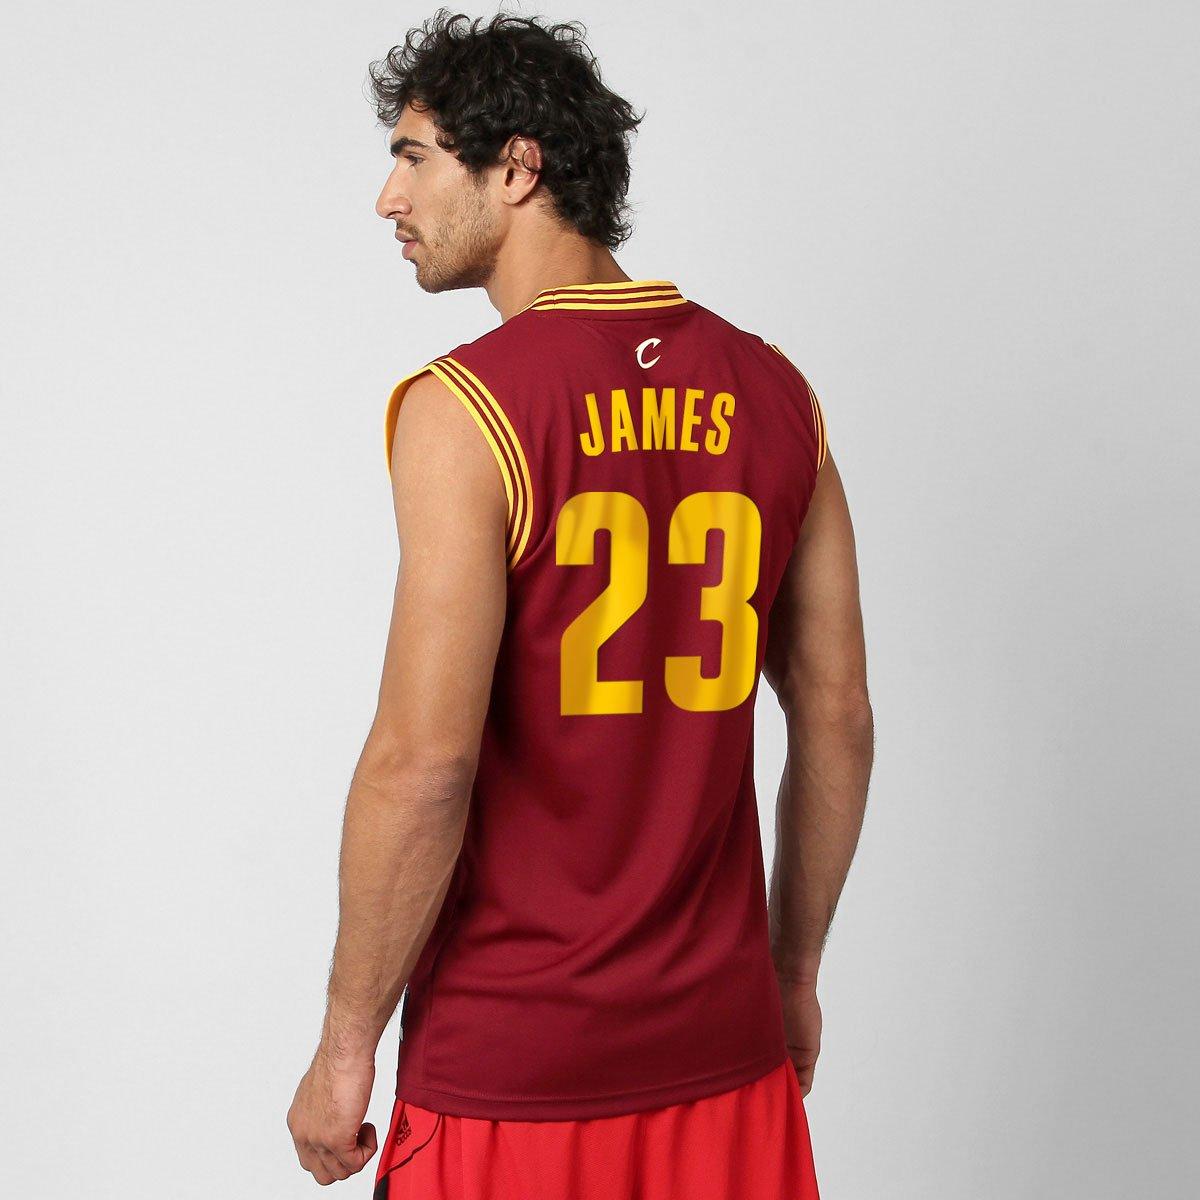 rojo Viento Firmar  Camiseta Regata Adidas Cleveland Cavaliers Road nº 23 - James | Netshoes